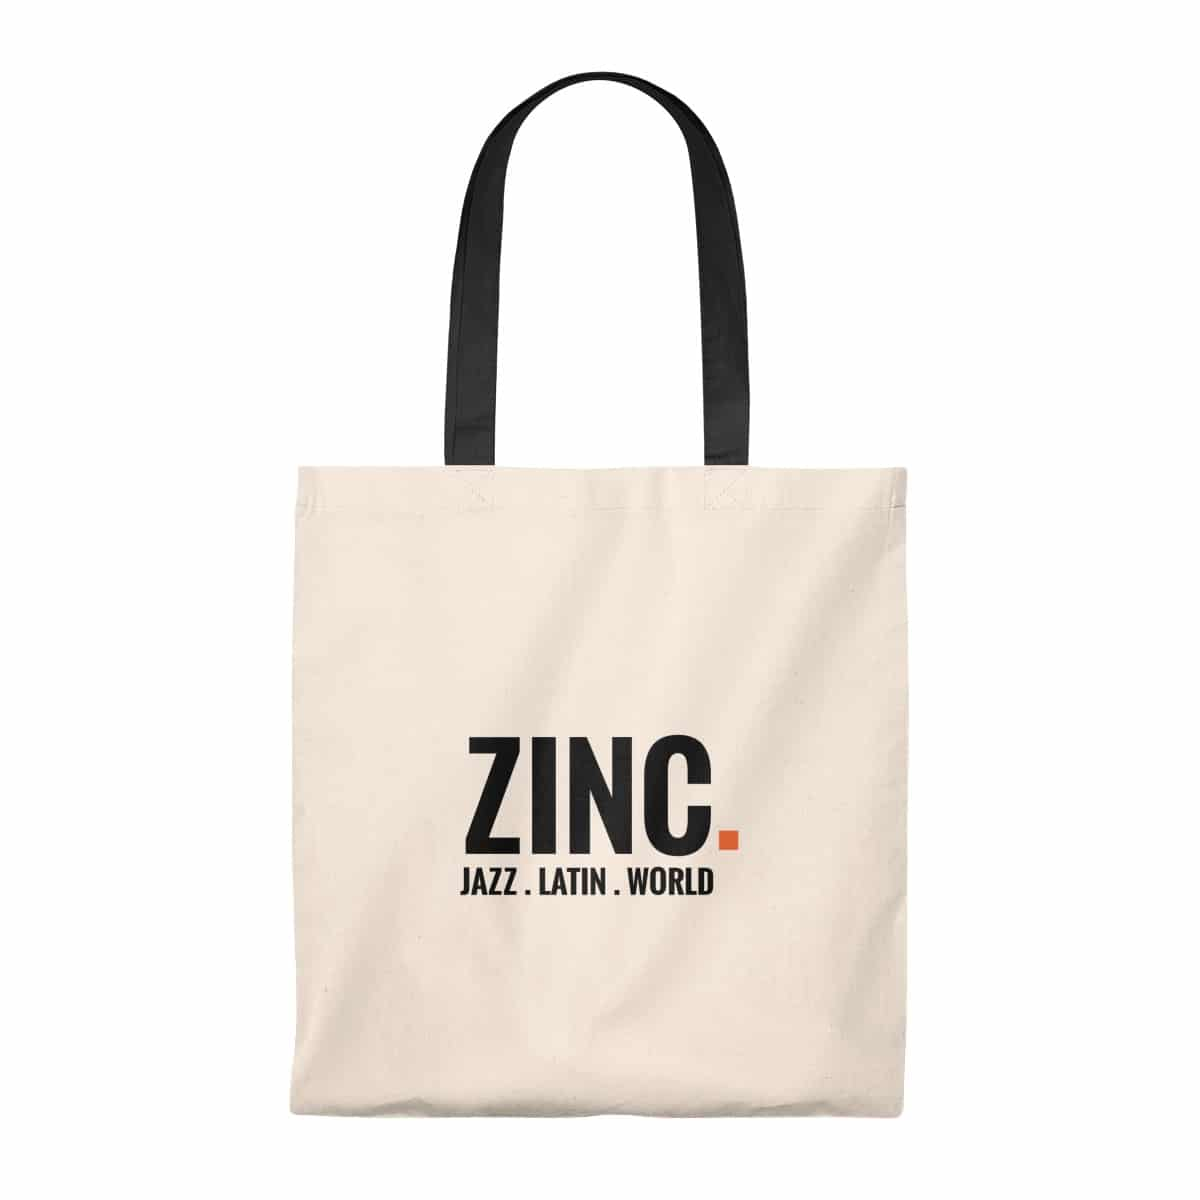 Zinc Tote Bag Vintage